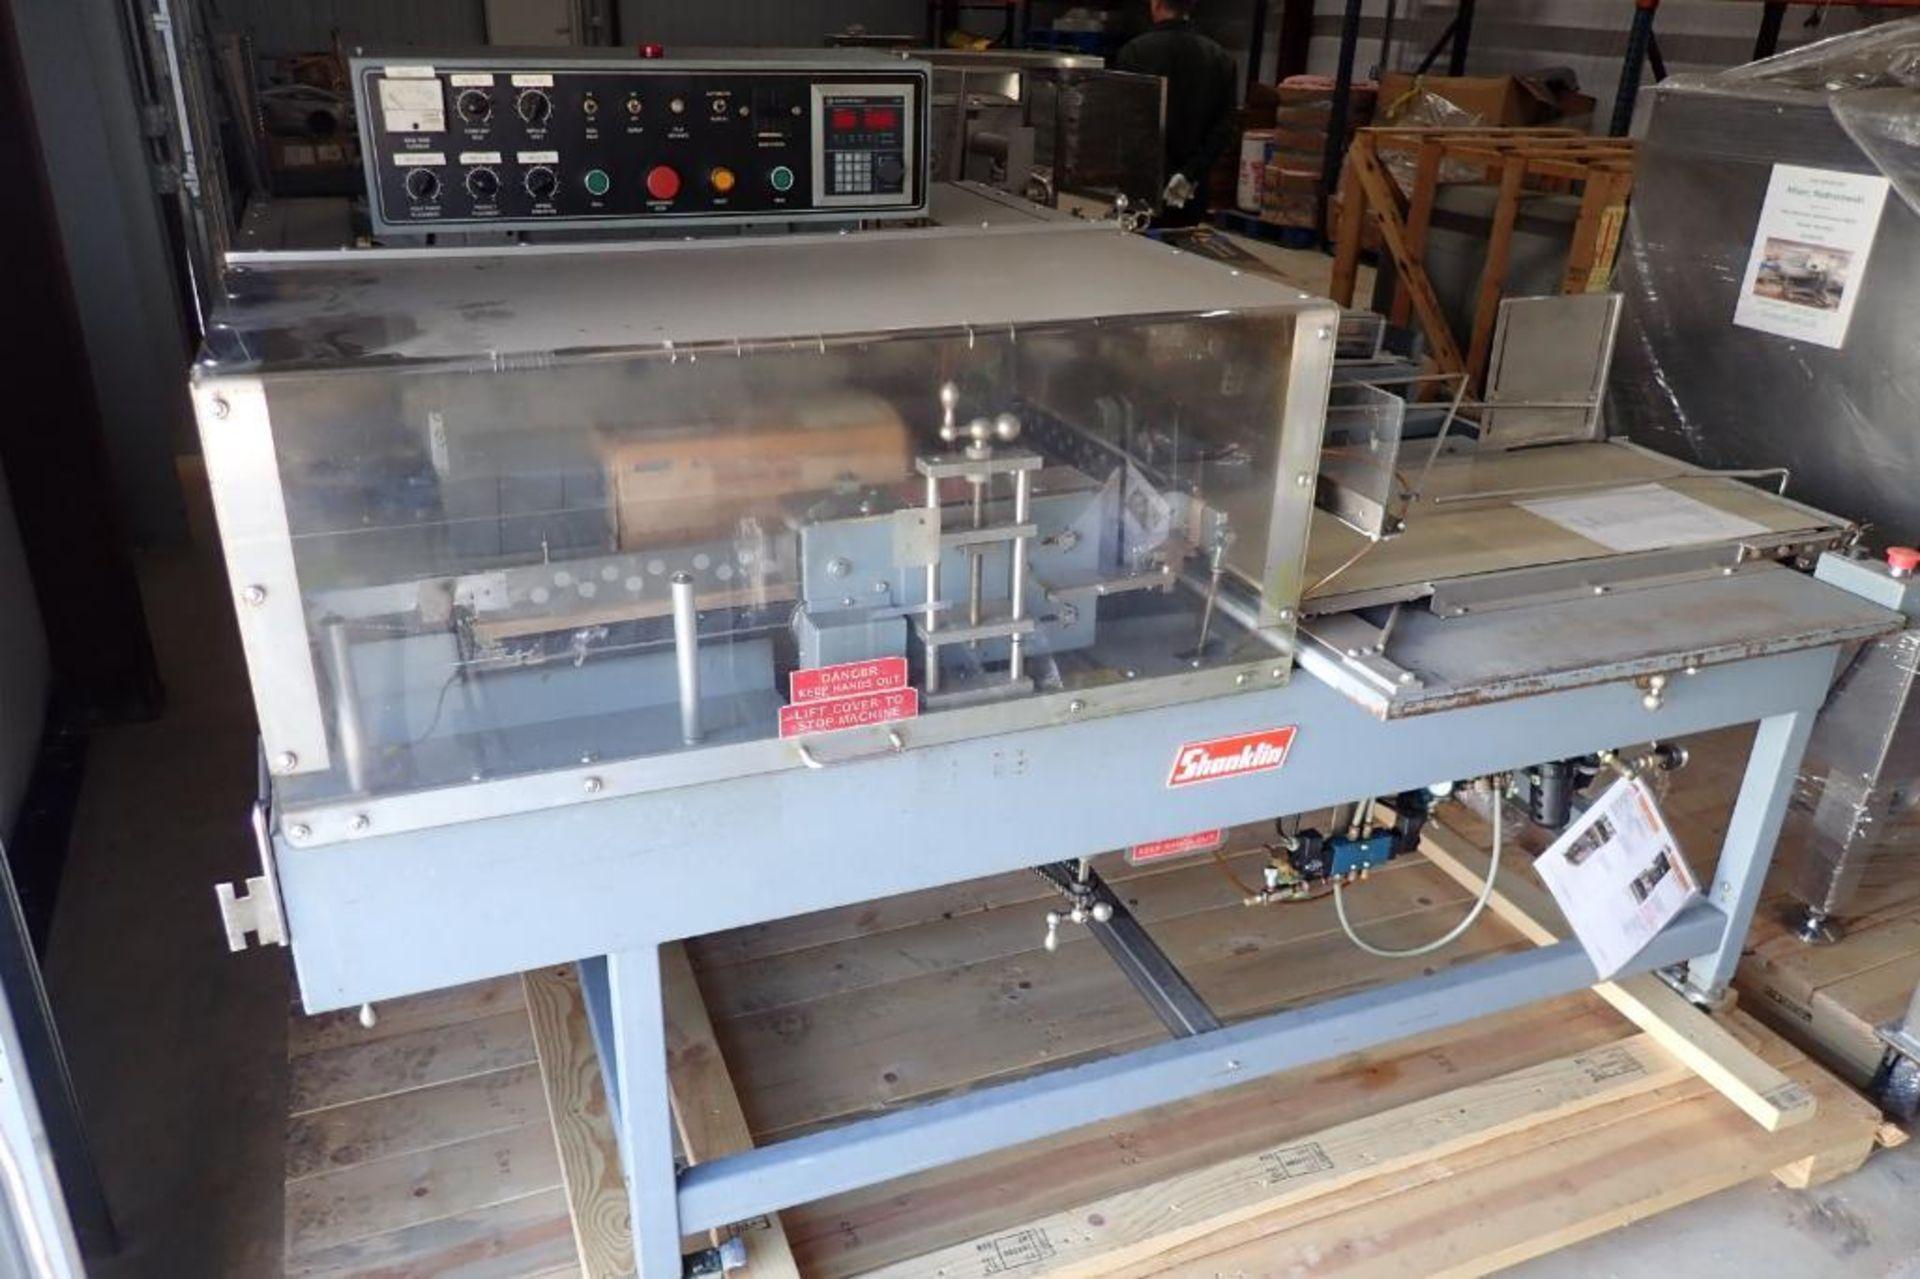 Lot 44 - Shanklin L-bar sealer - (Located in Fayetteville, AR)